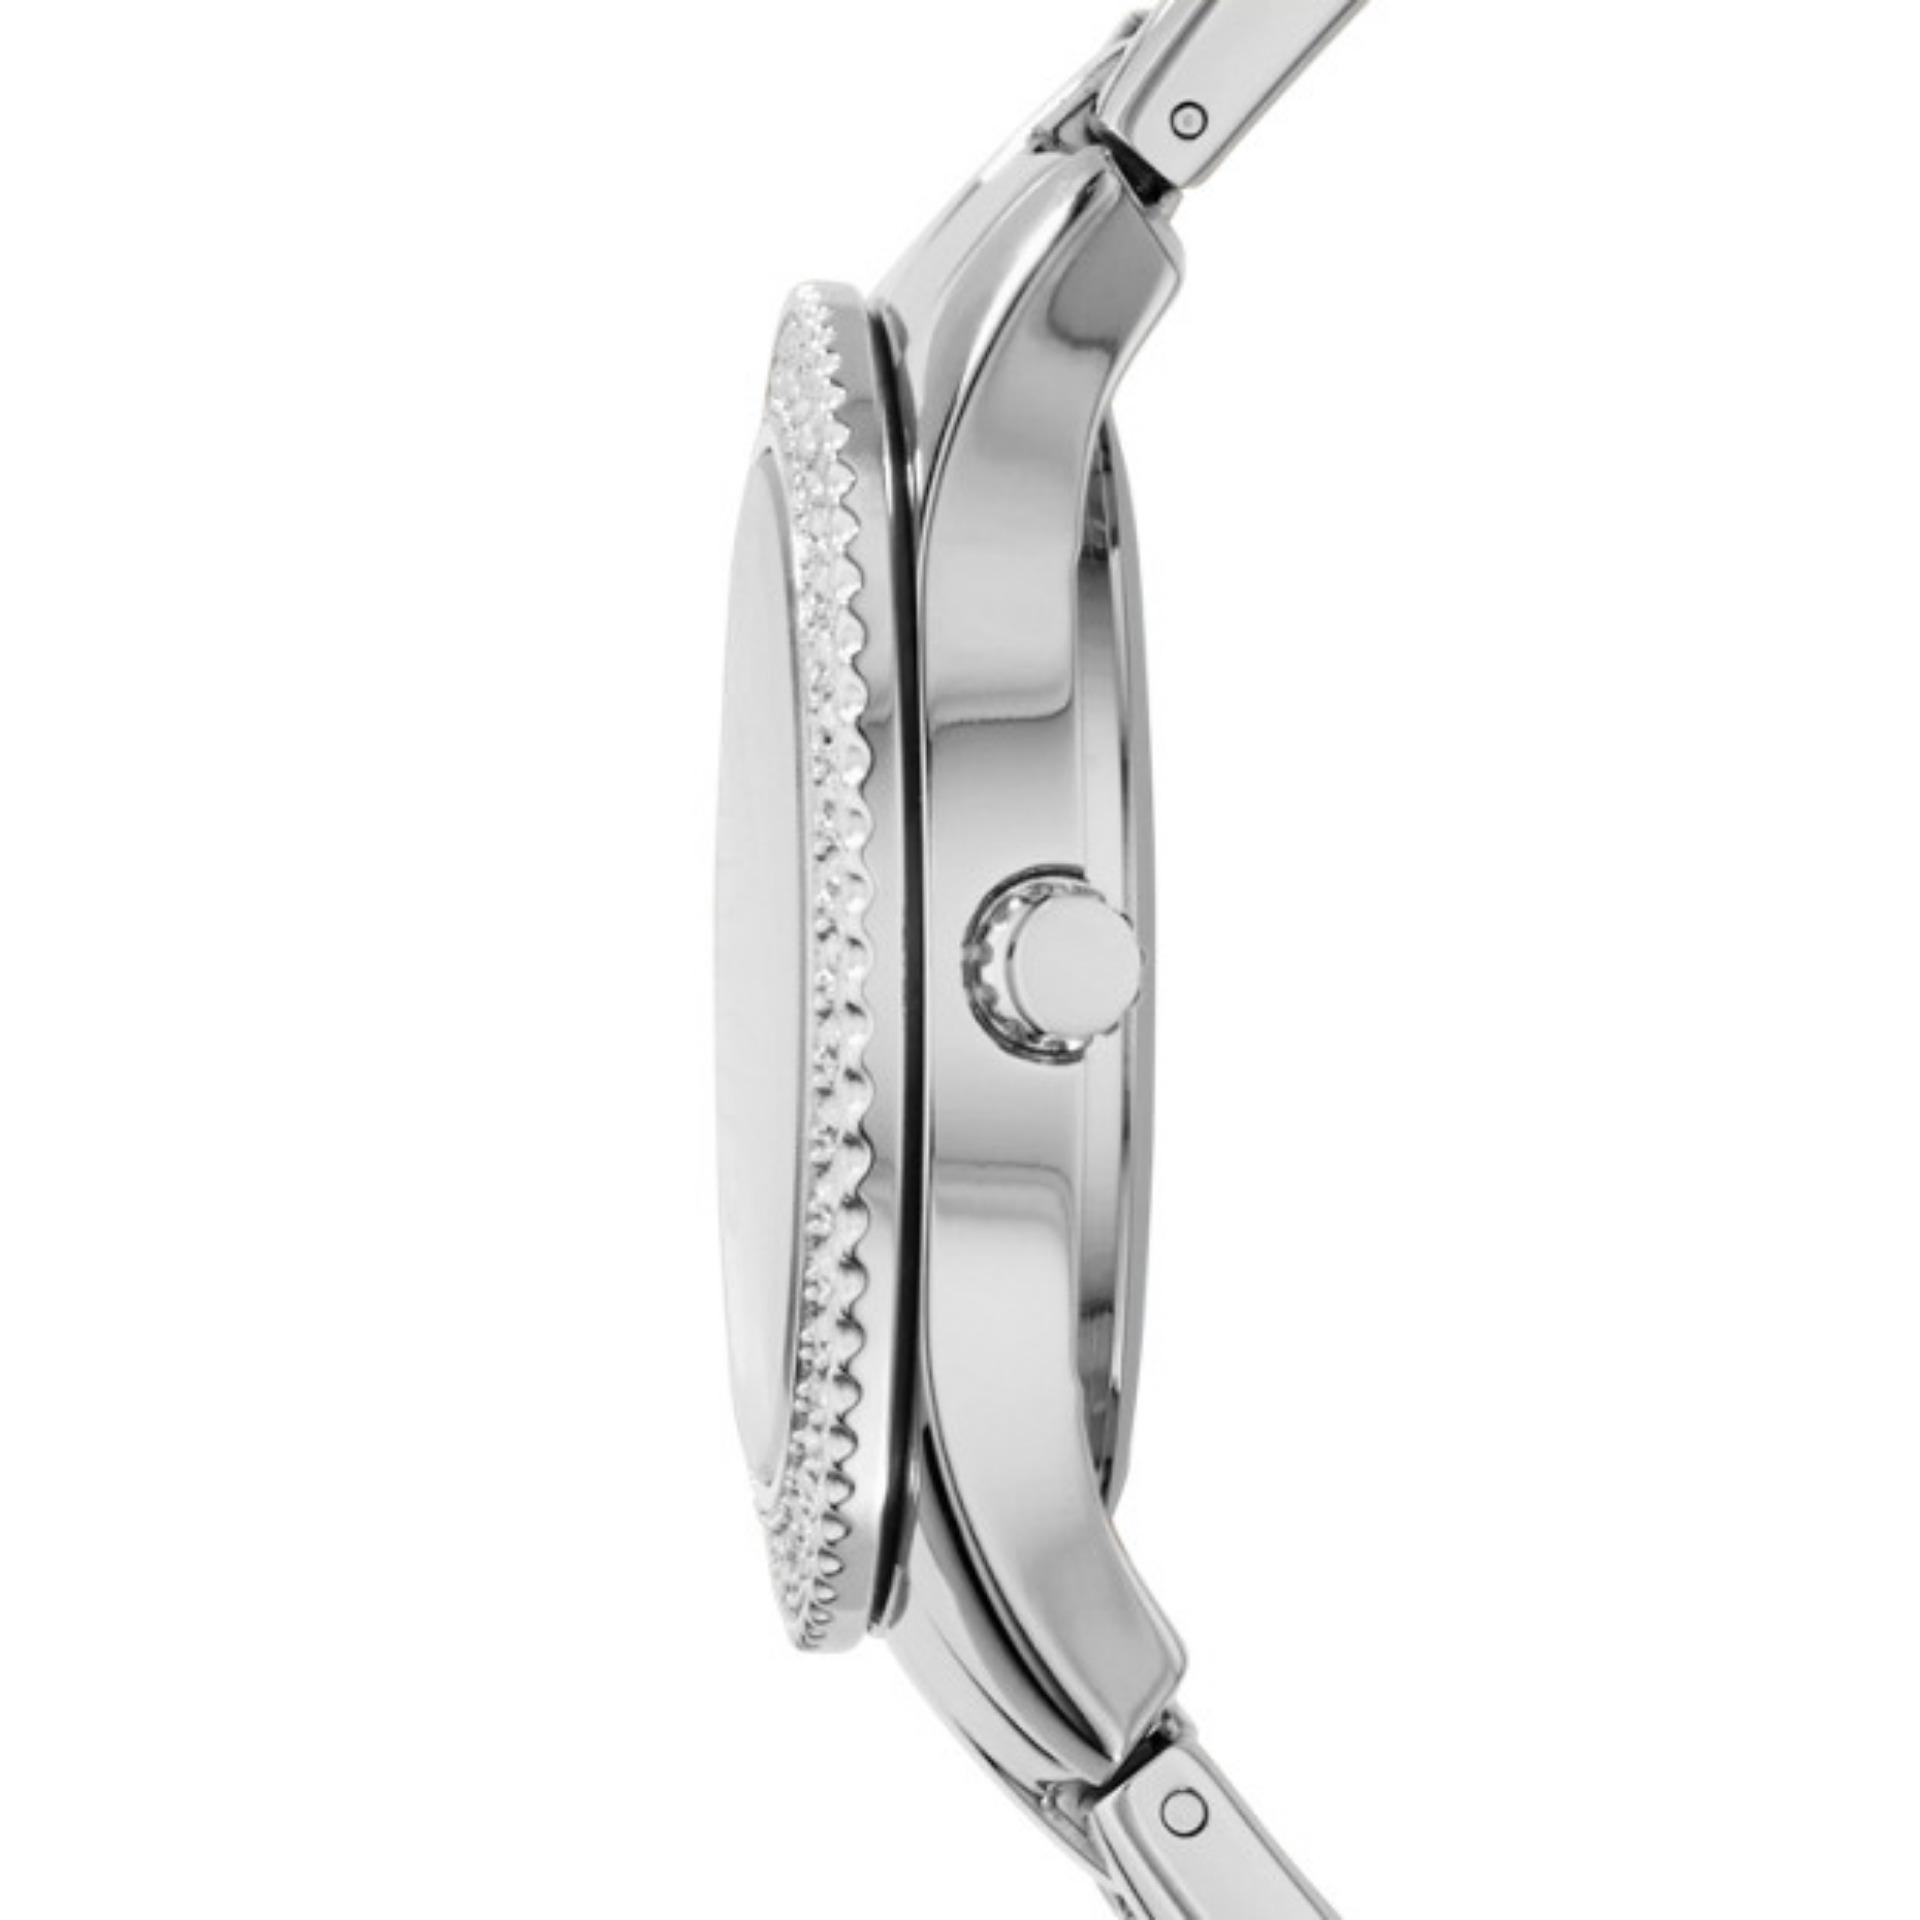 Fossil Automatic Me3078 Jam Tangan Wanita Referensi Daftar Harga Perfect Boyfriend Multifunction Es4146 Es3588 Stella Stainless Steel Watch